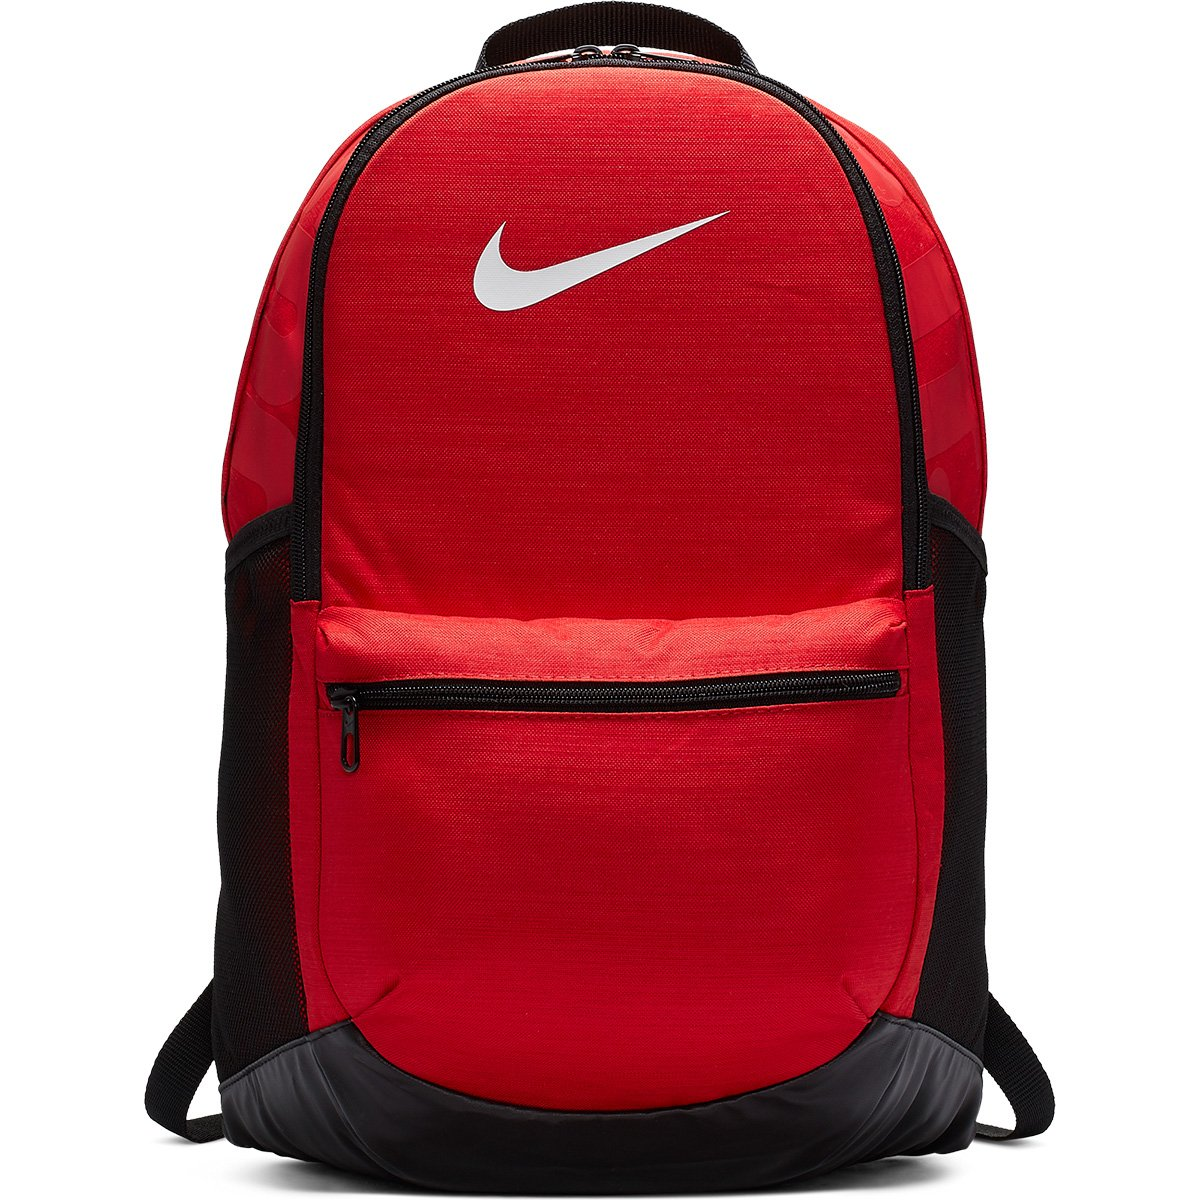 muy genial seleccione para mejor Venta caliente genuino Mochila Nike Brasília M - 24 Litros - Vermelho e Preto